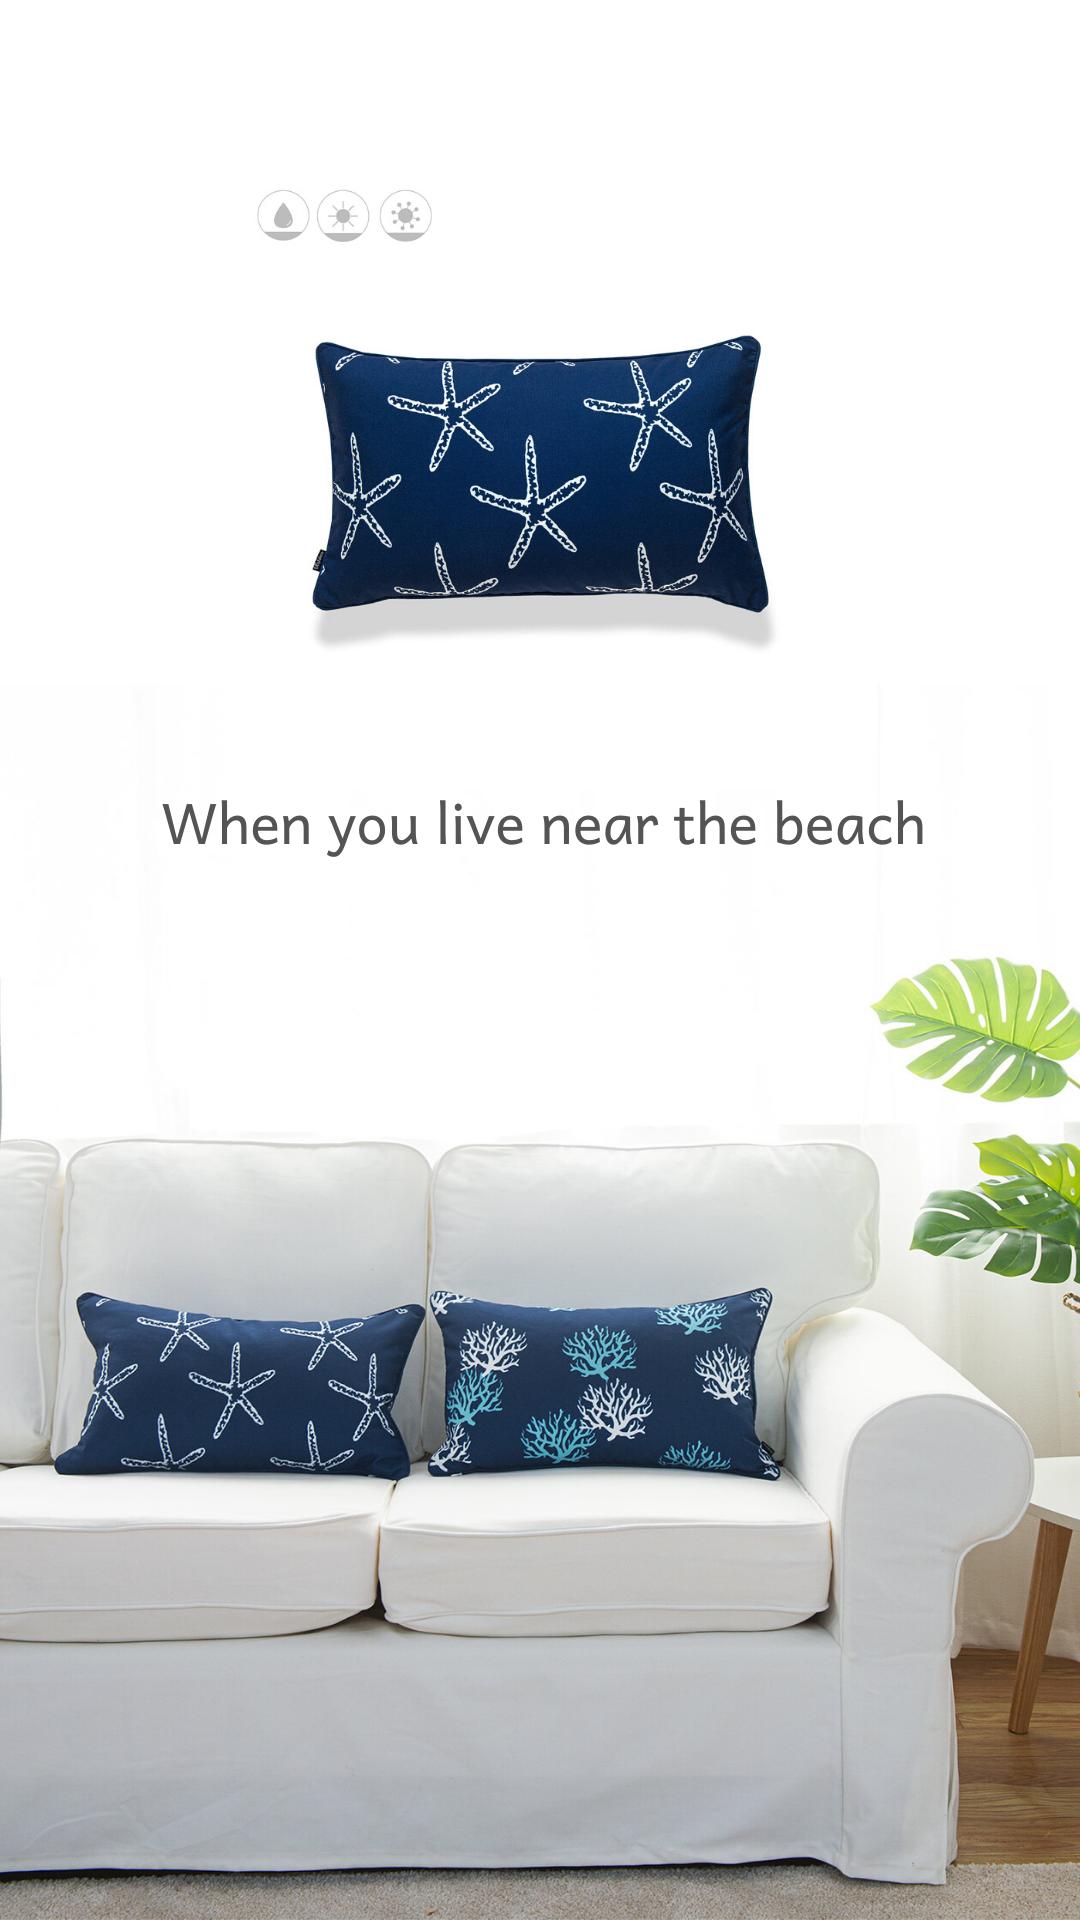 Hofdeco Coastal Nautical Pillow